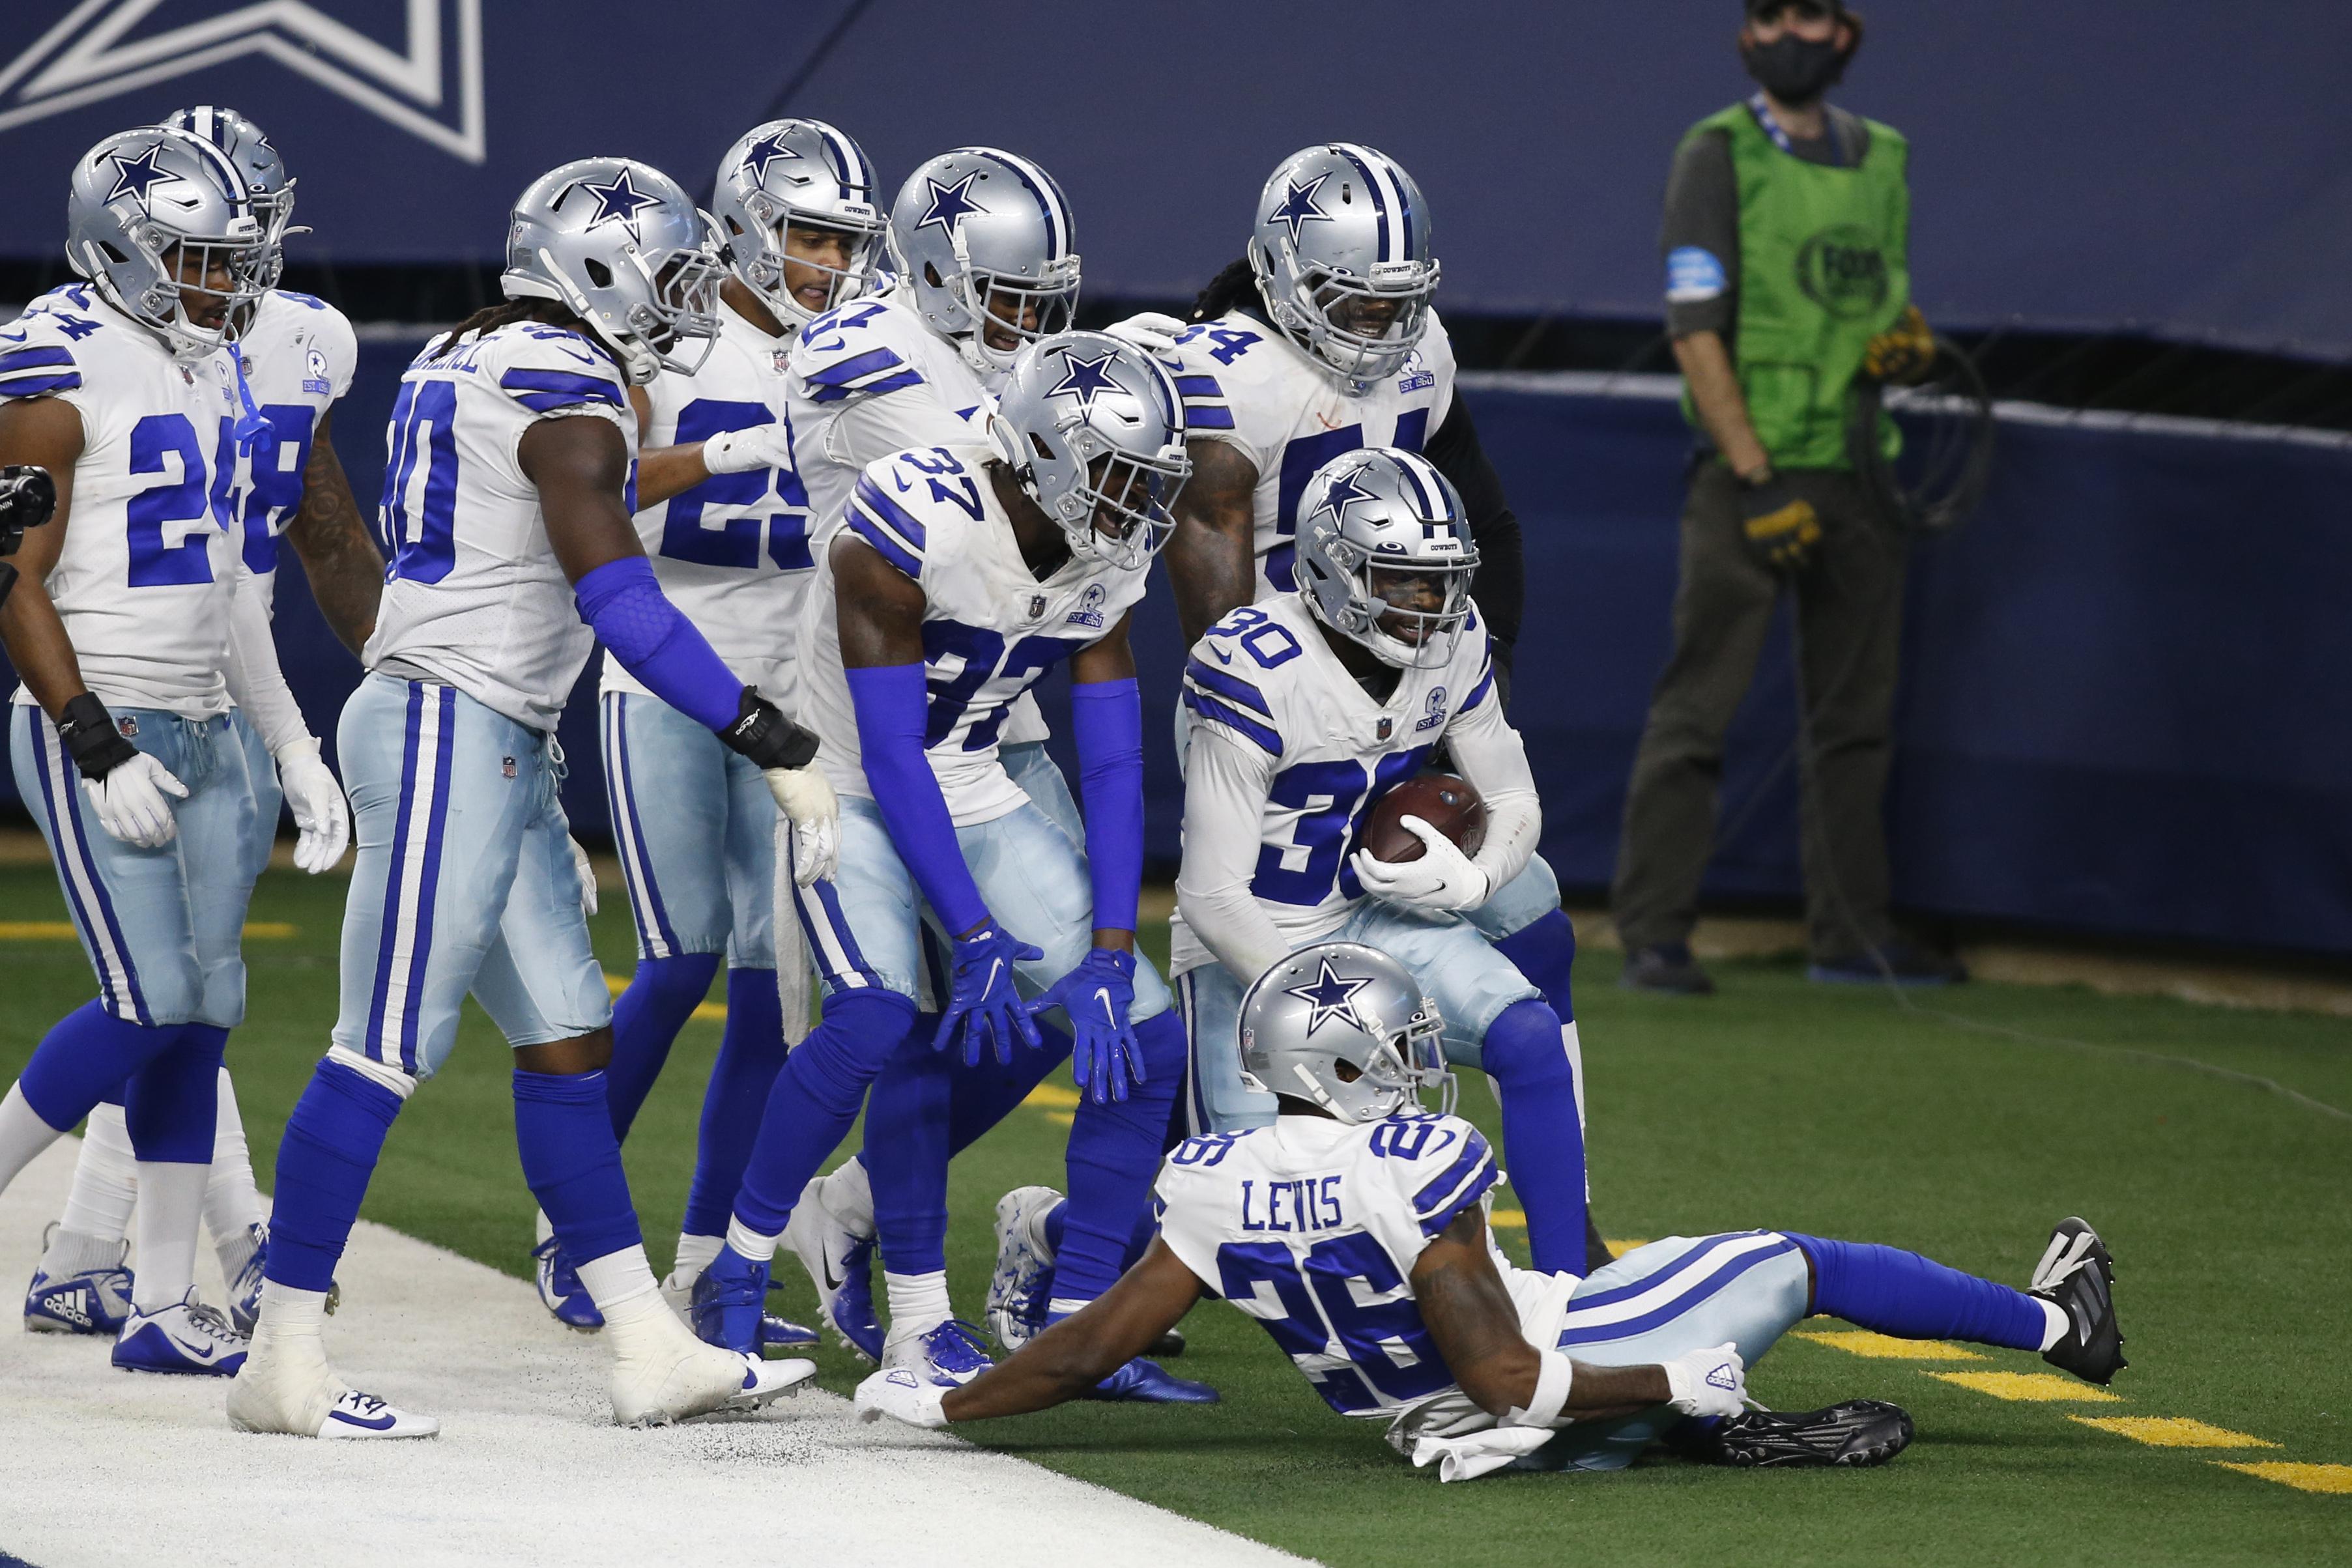 Dec 27, 2020; Arlington, Texas, USA; Dallas Cowboys cornerback Anthony Brown (30) celebrates an interception with teammates against the Philadelphia Eagles in the fourth quarter at AT&T Stadium. Mandatory Credit: Tim Heitman-USA TODAY Sports